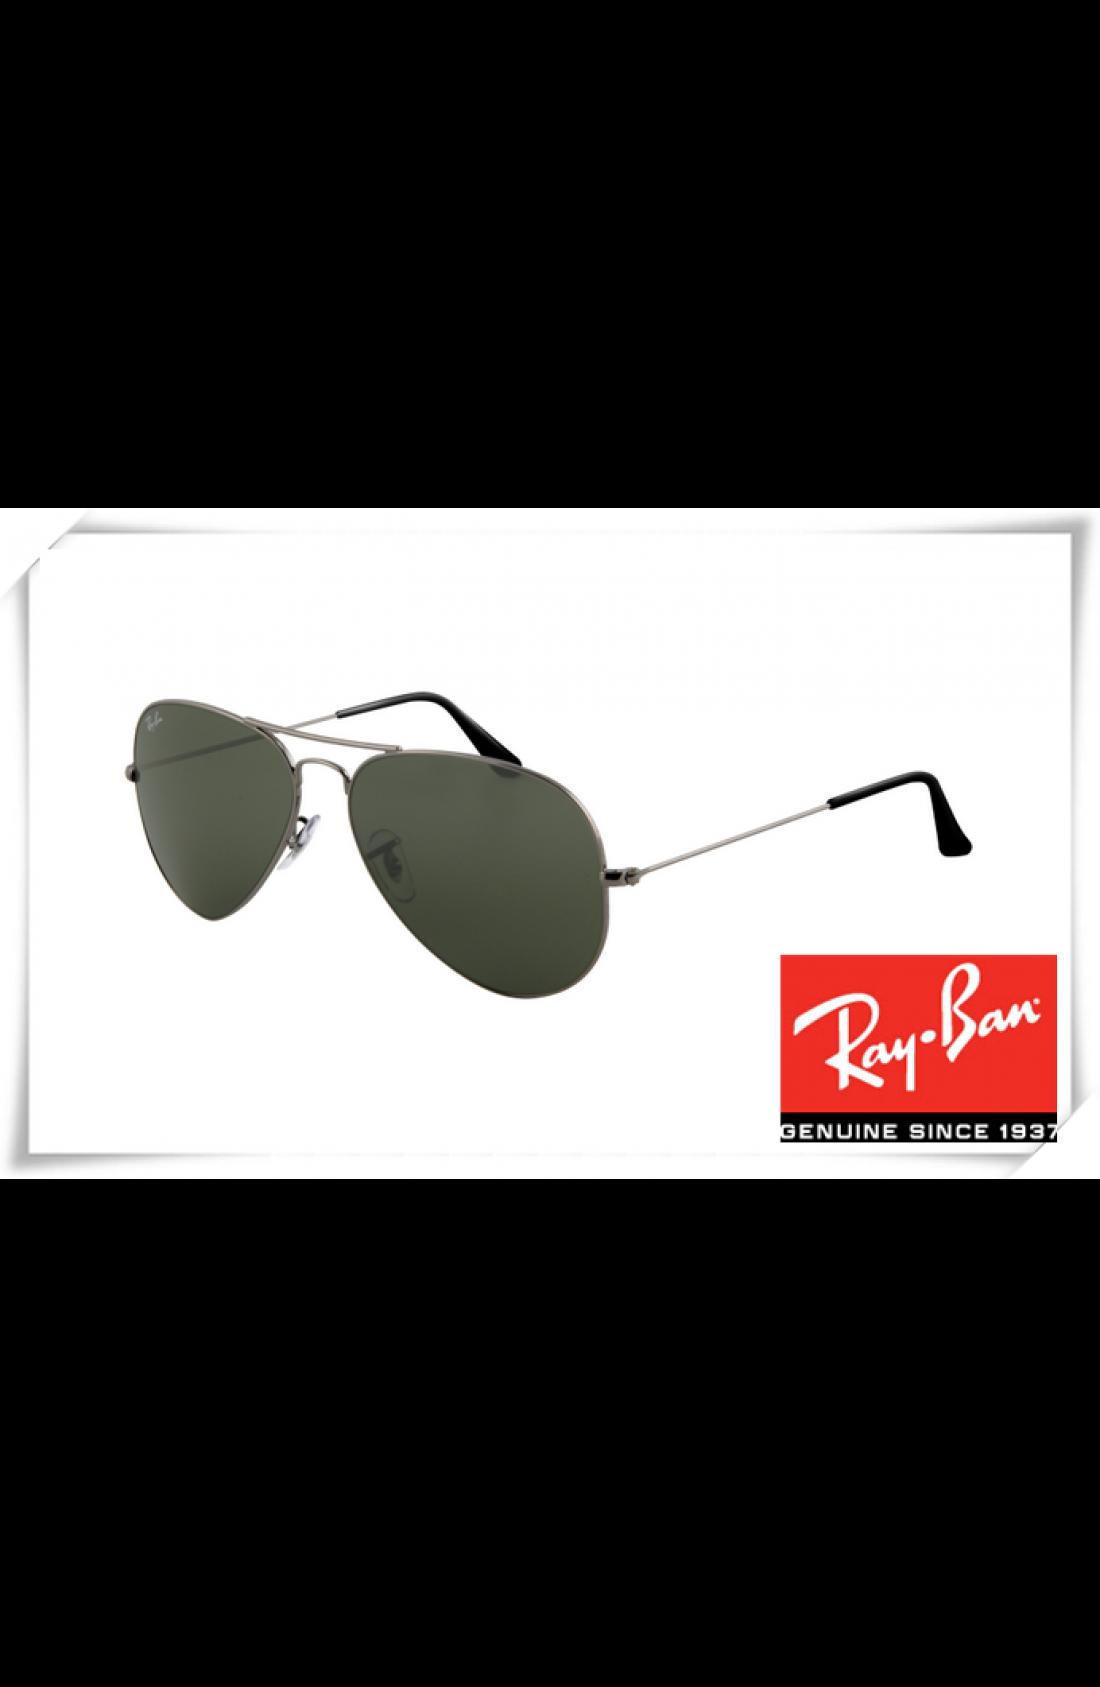 e3a7e8a26d Cheap Fake Ray Ban RB3025 Aviator Sunglasses Gunmetal Frame Deep ...